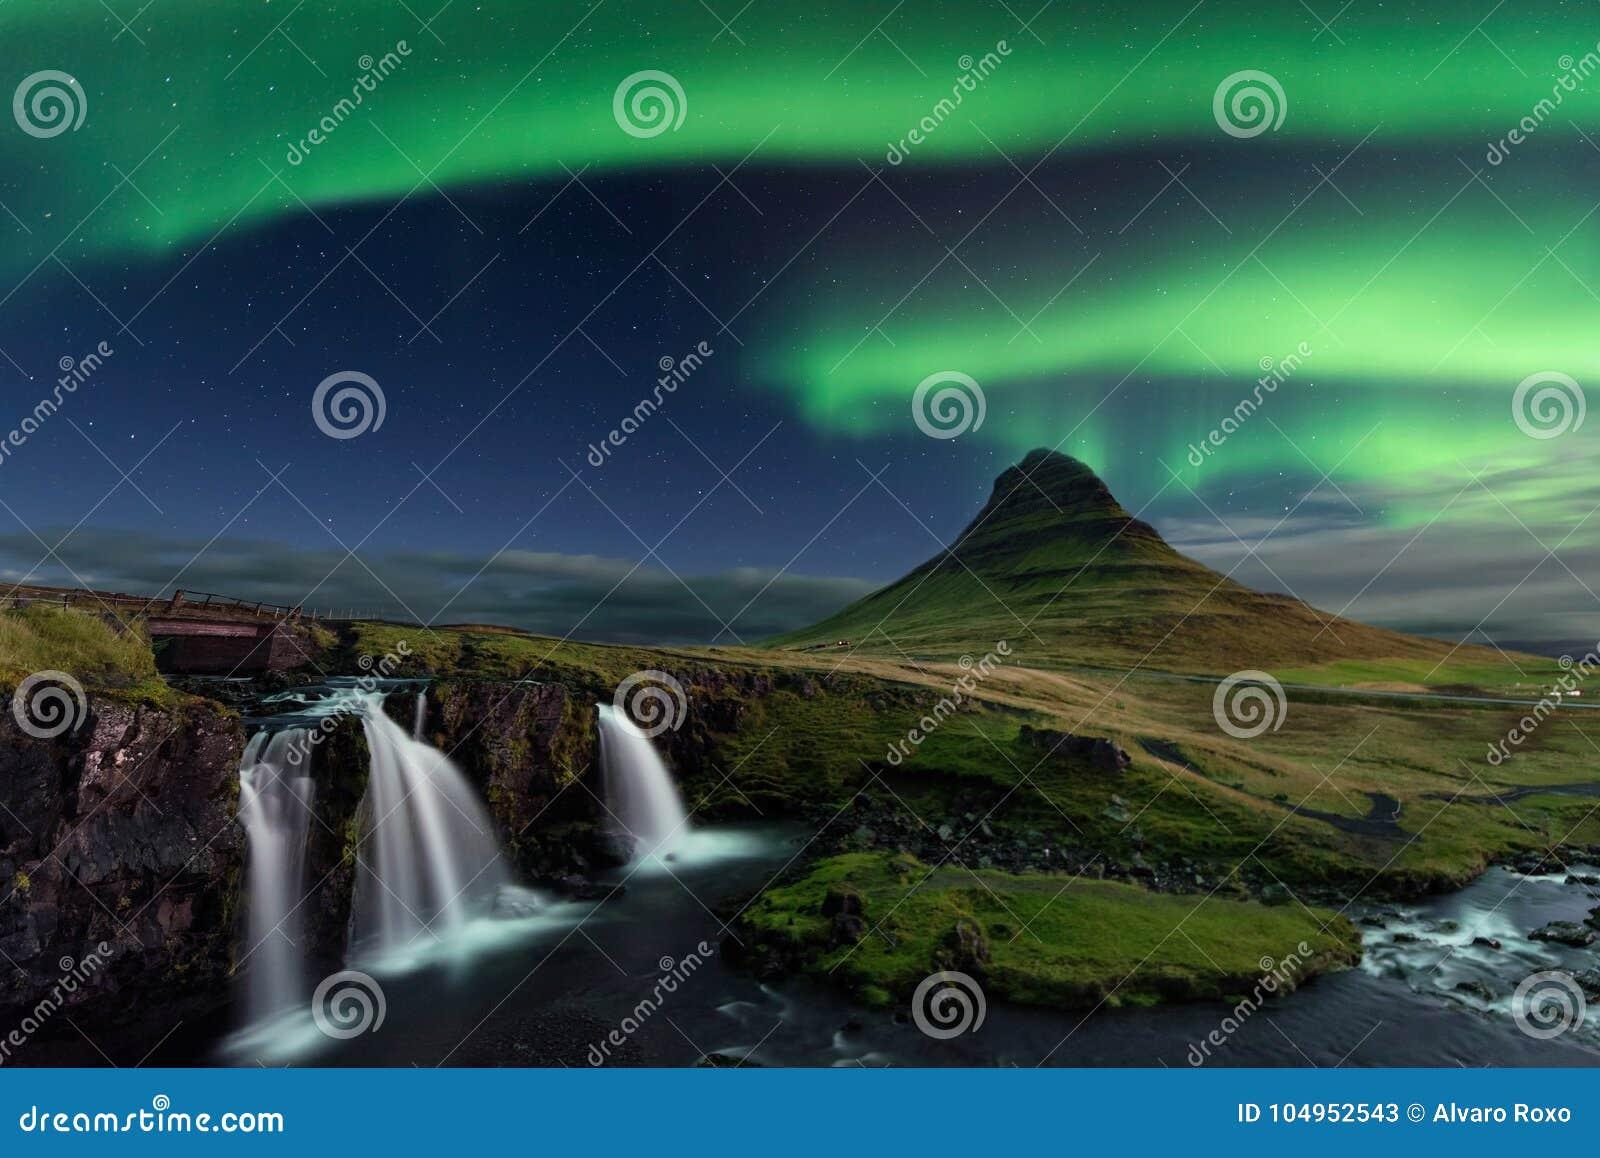 Aurora Borealis over Kirkjufell in Iceland